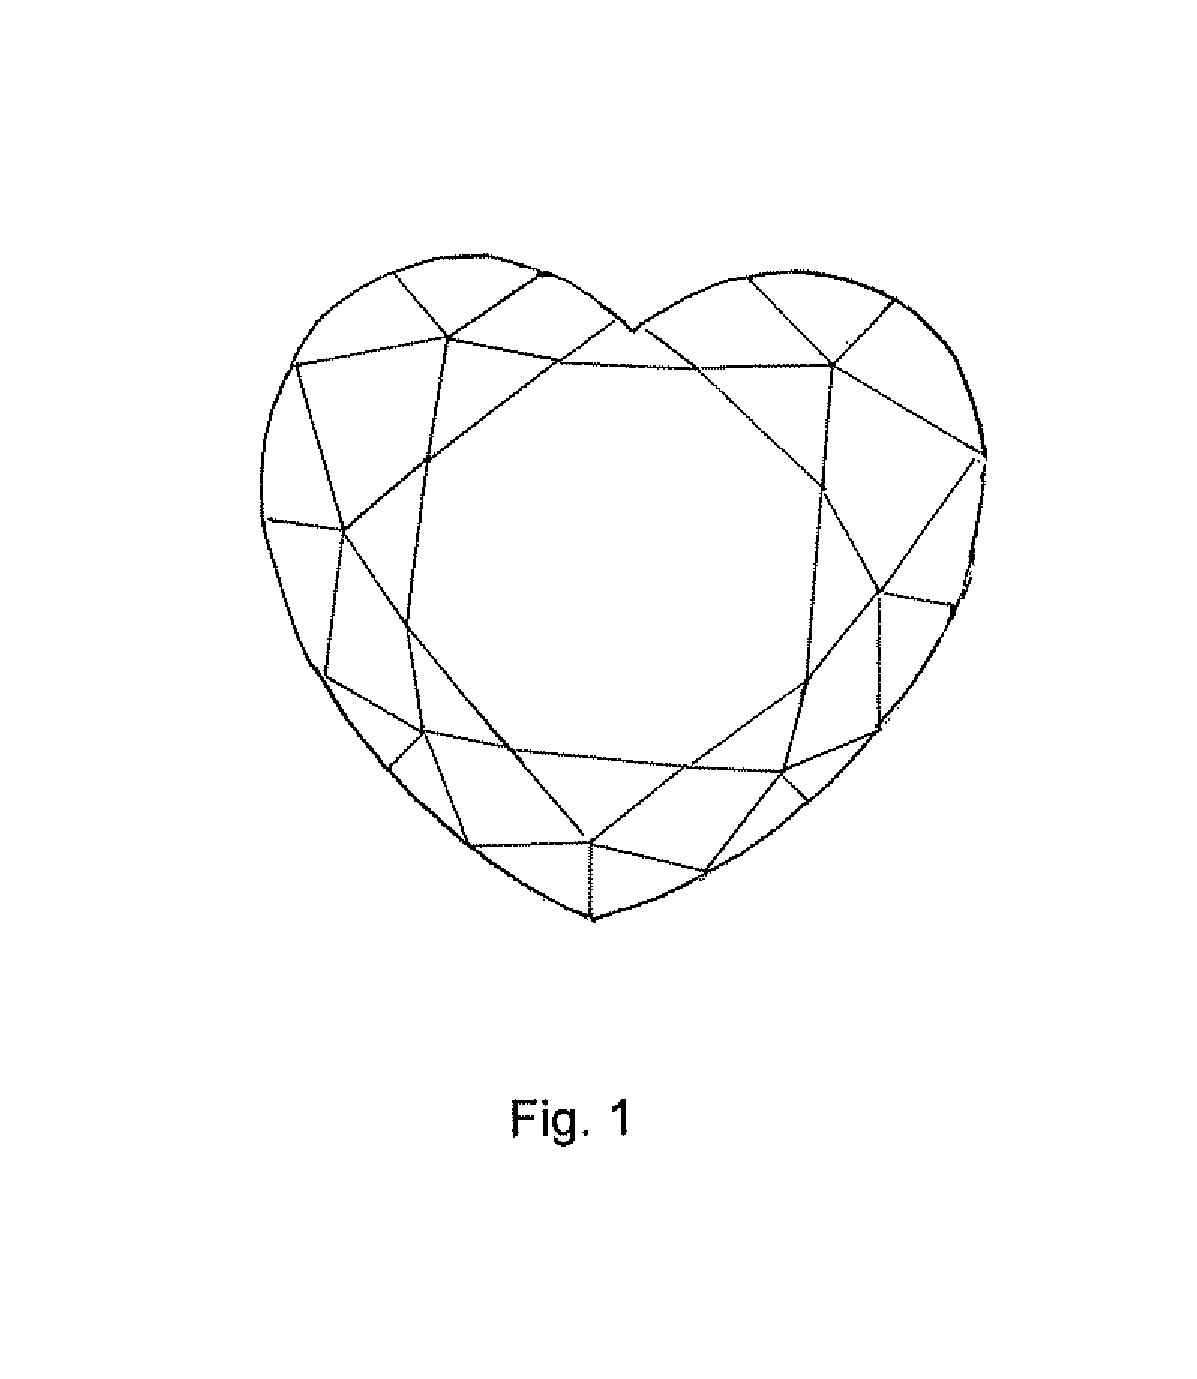 patent usd567137 heart shaped diamond or similar article